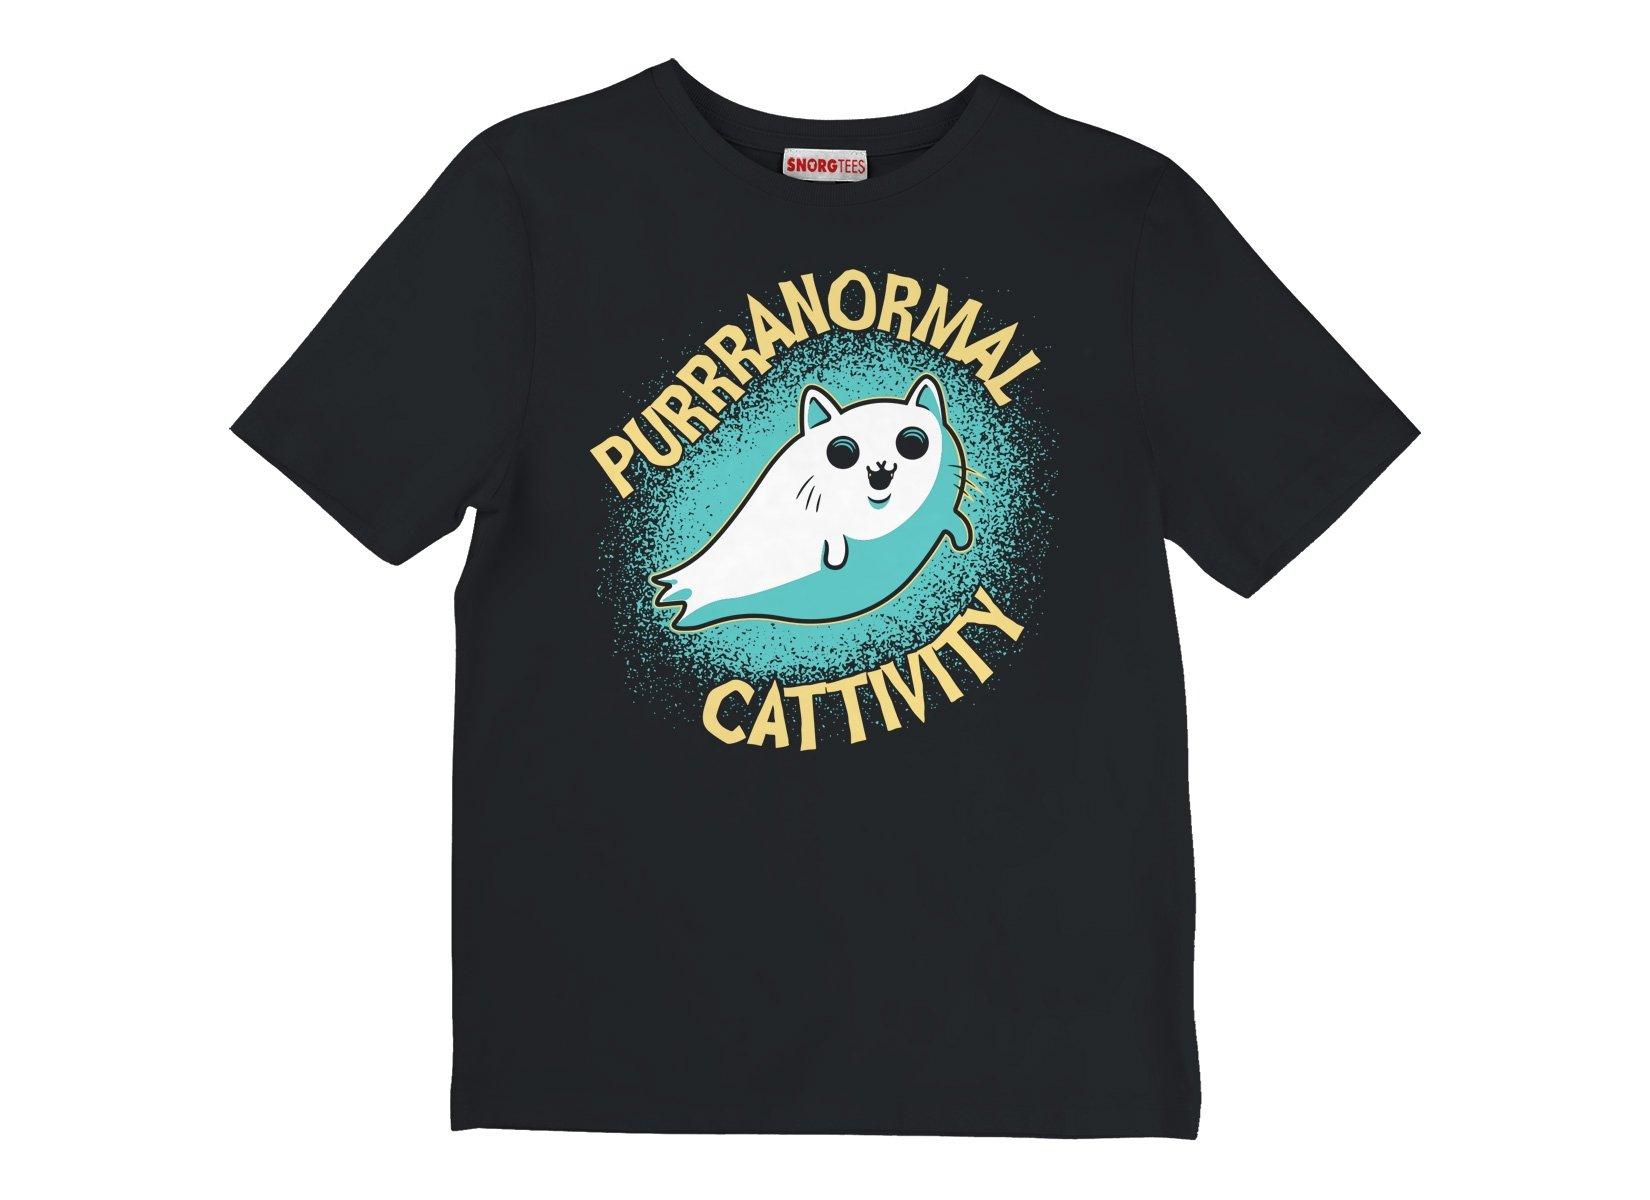 Purrranormal Cattivity on Kids T-Shirt